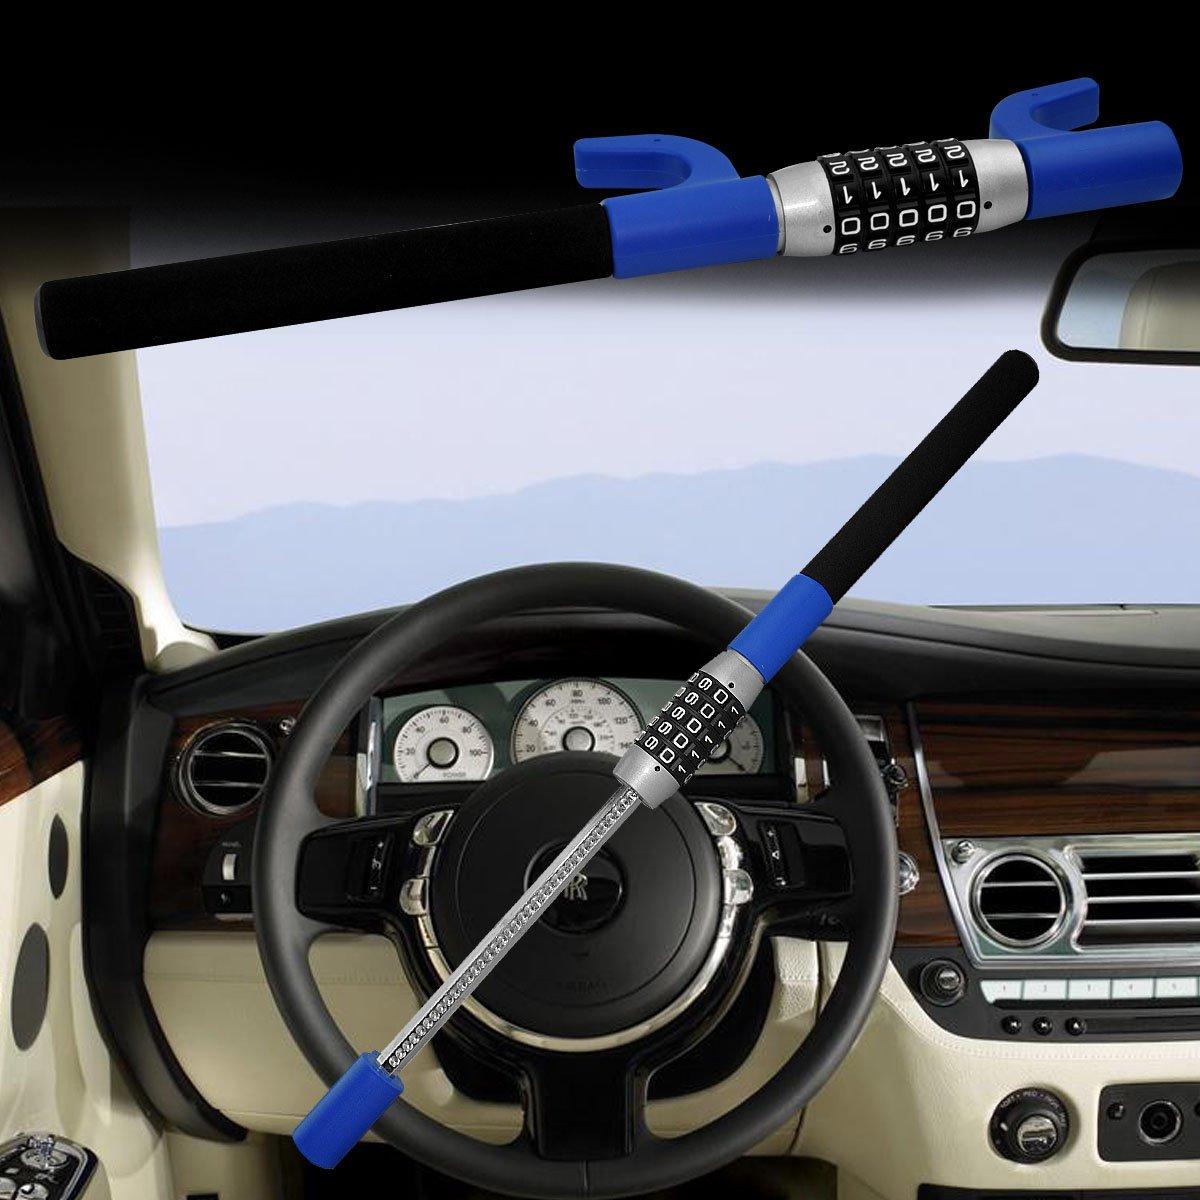 New Universal Anti-Theft Car Steering Wheel Lock Security with Key Car Van Truck